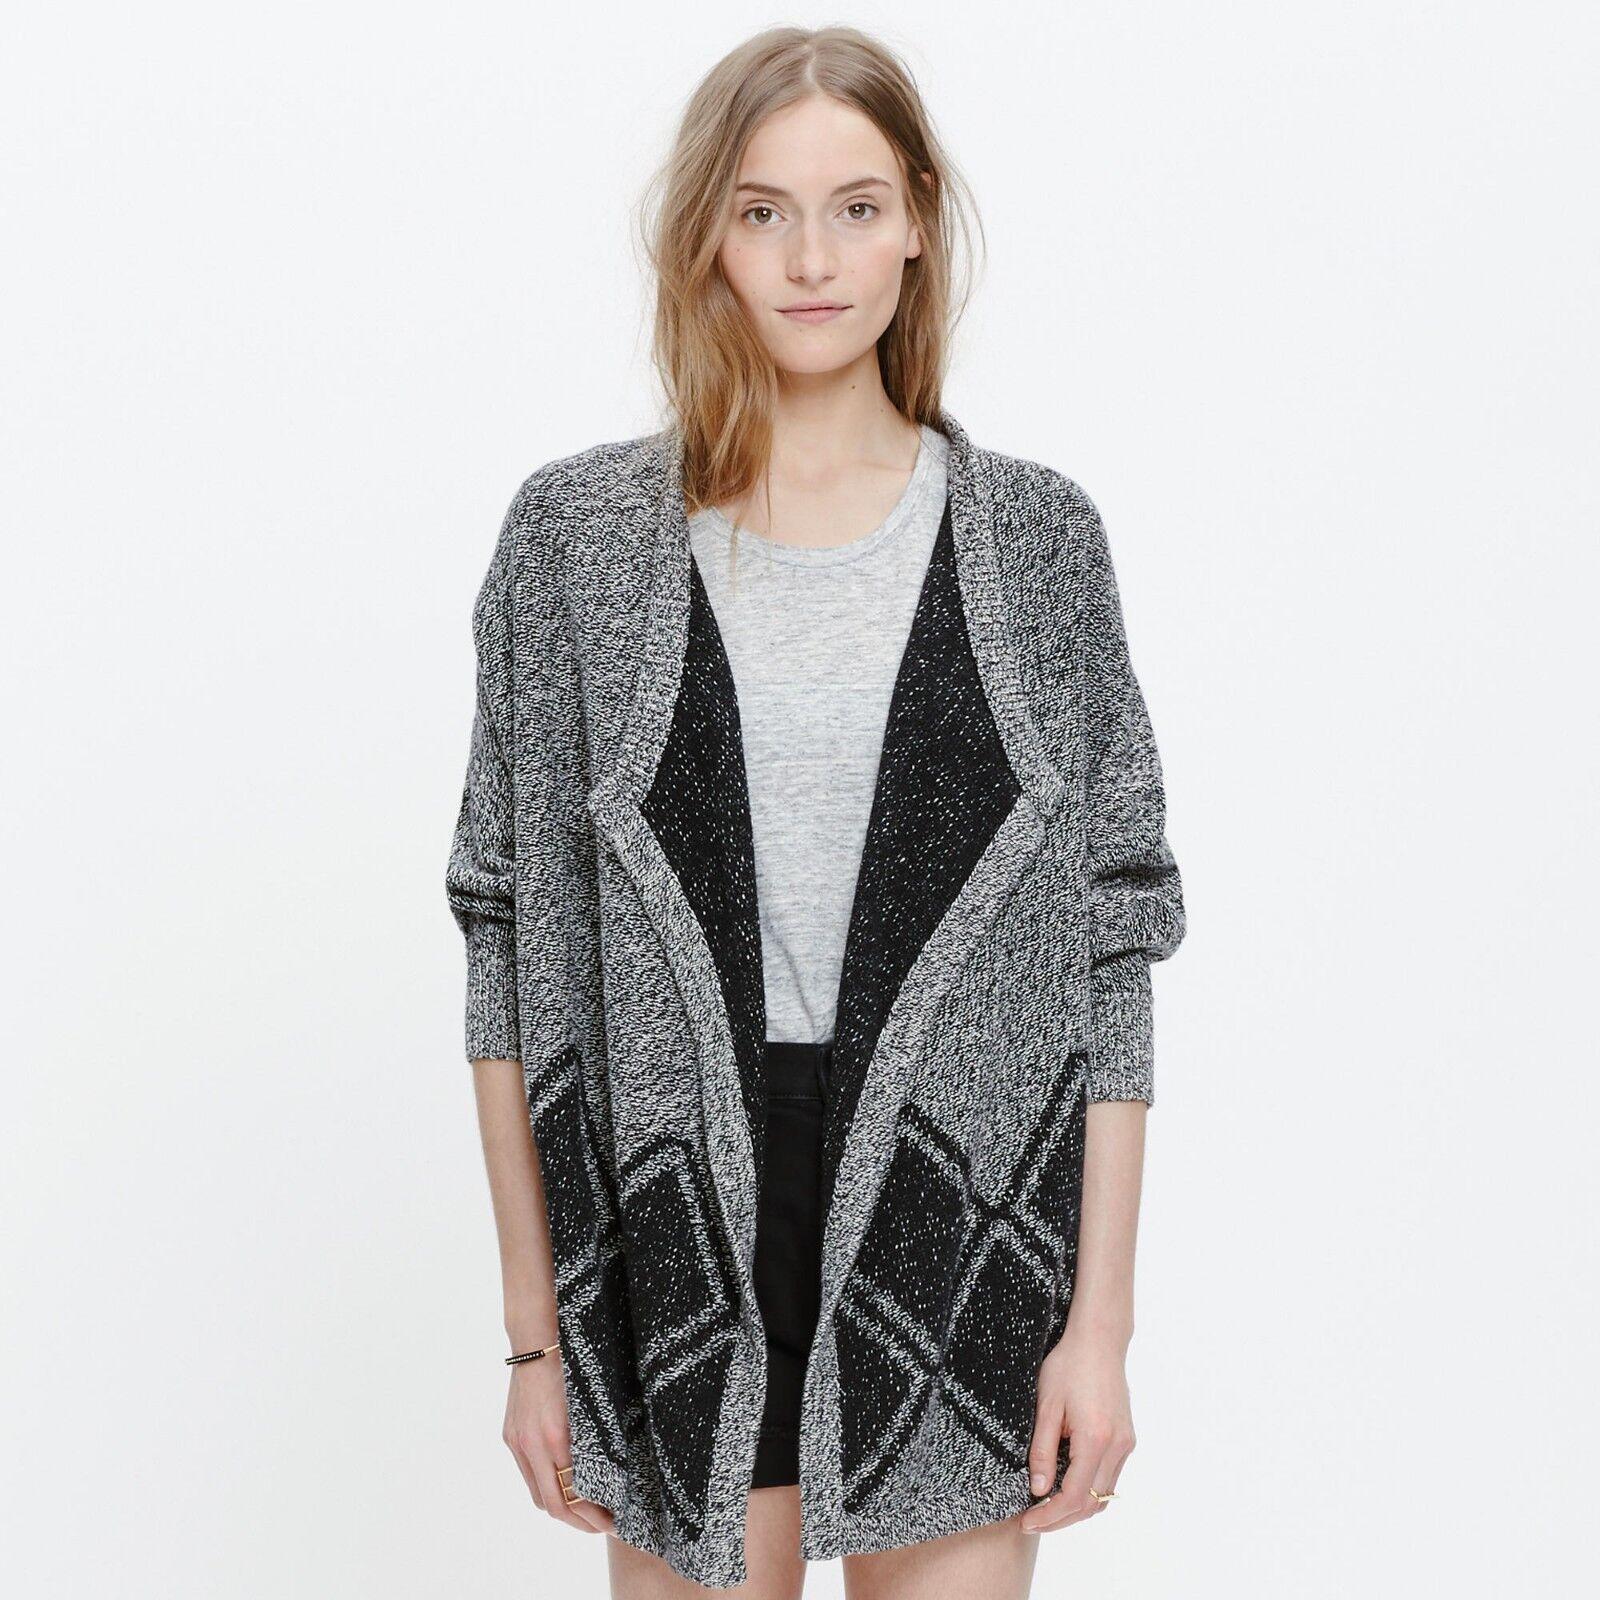 Madewell all angles Öffnen cardigan sweater diamond pattern drapey marled XS S